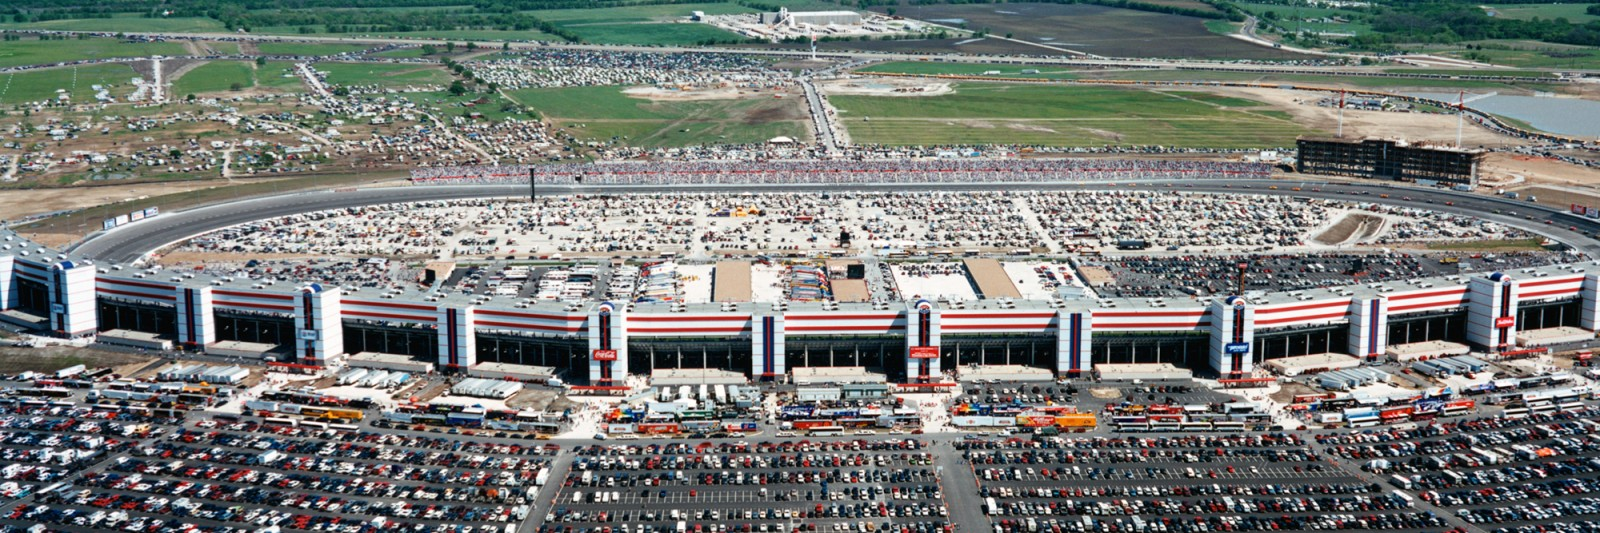 Texas Motor Speedway The Beck Group